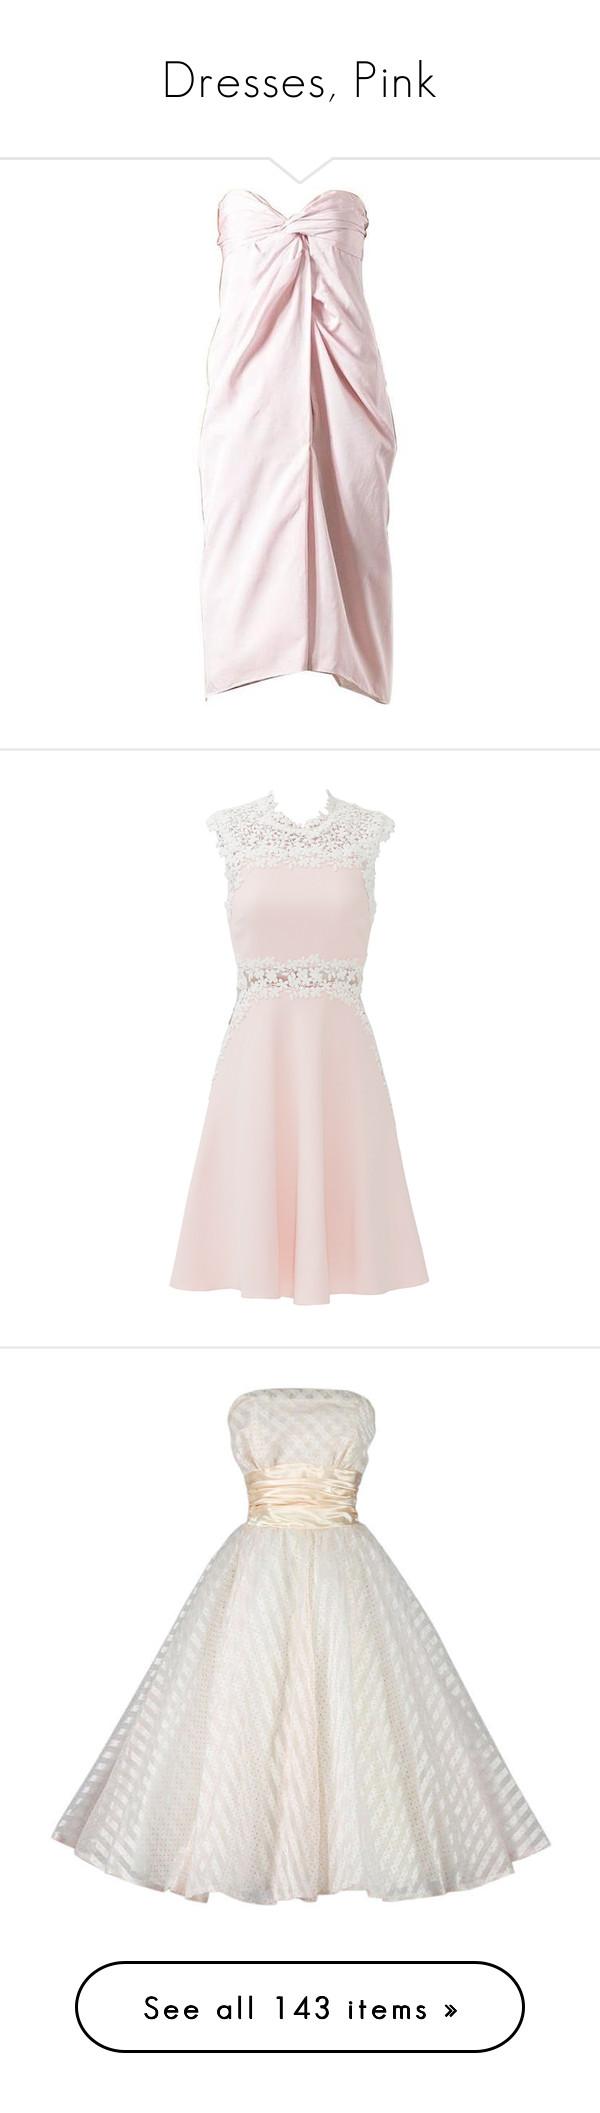 Dresses, Pink\